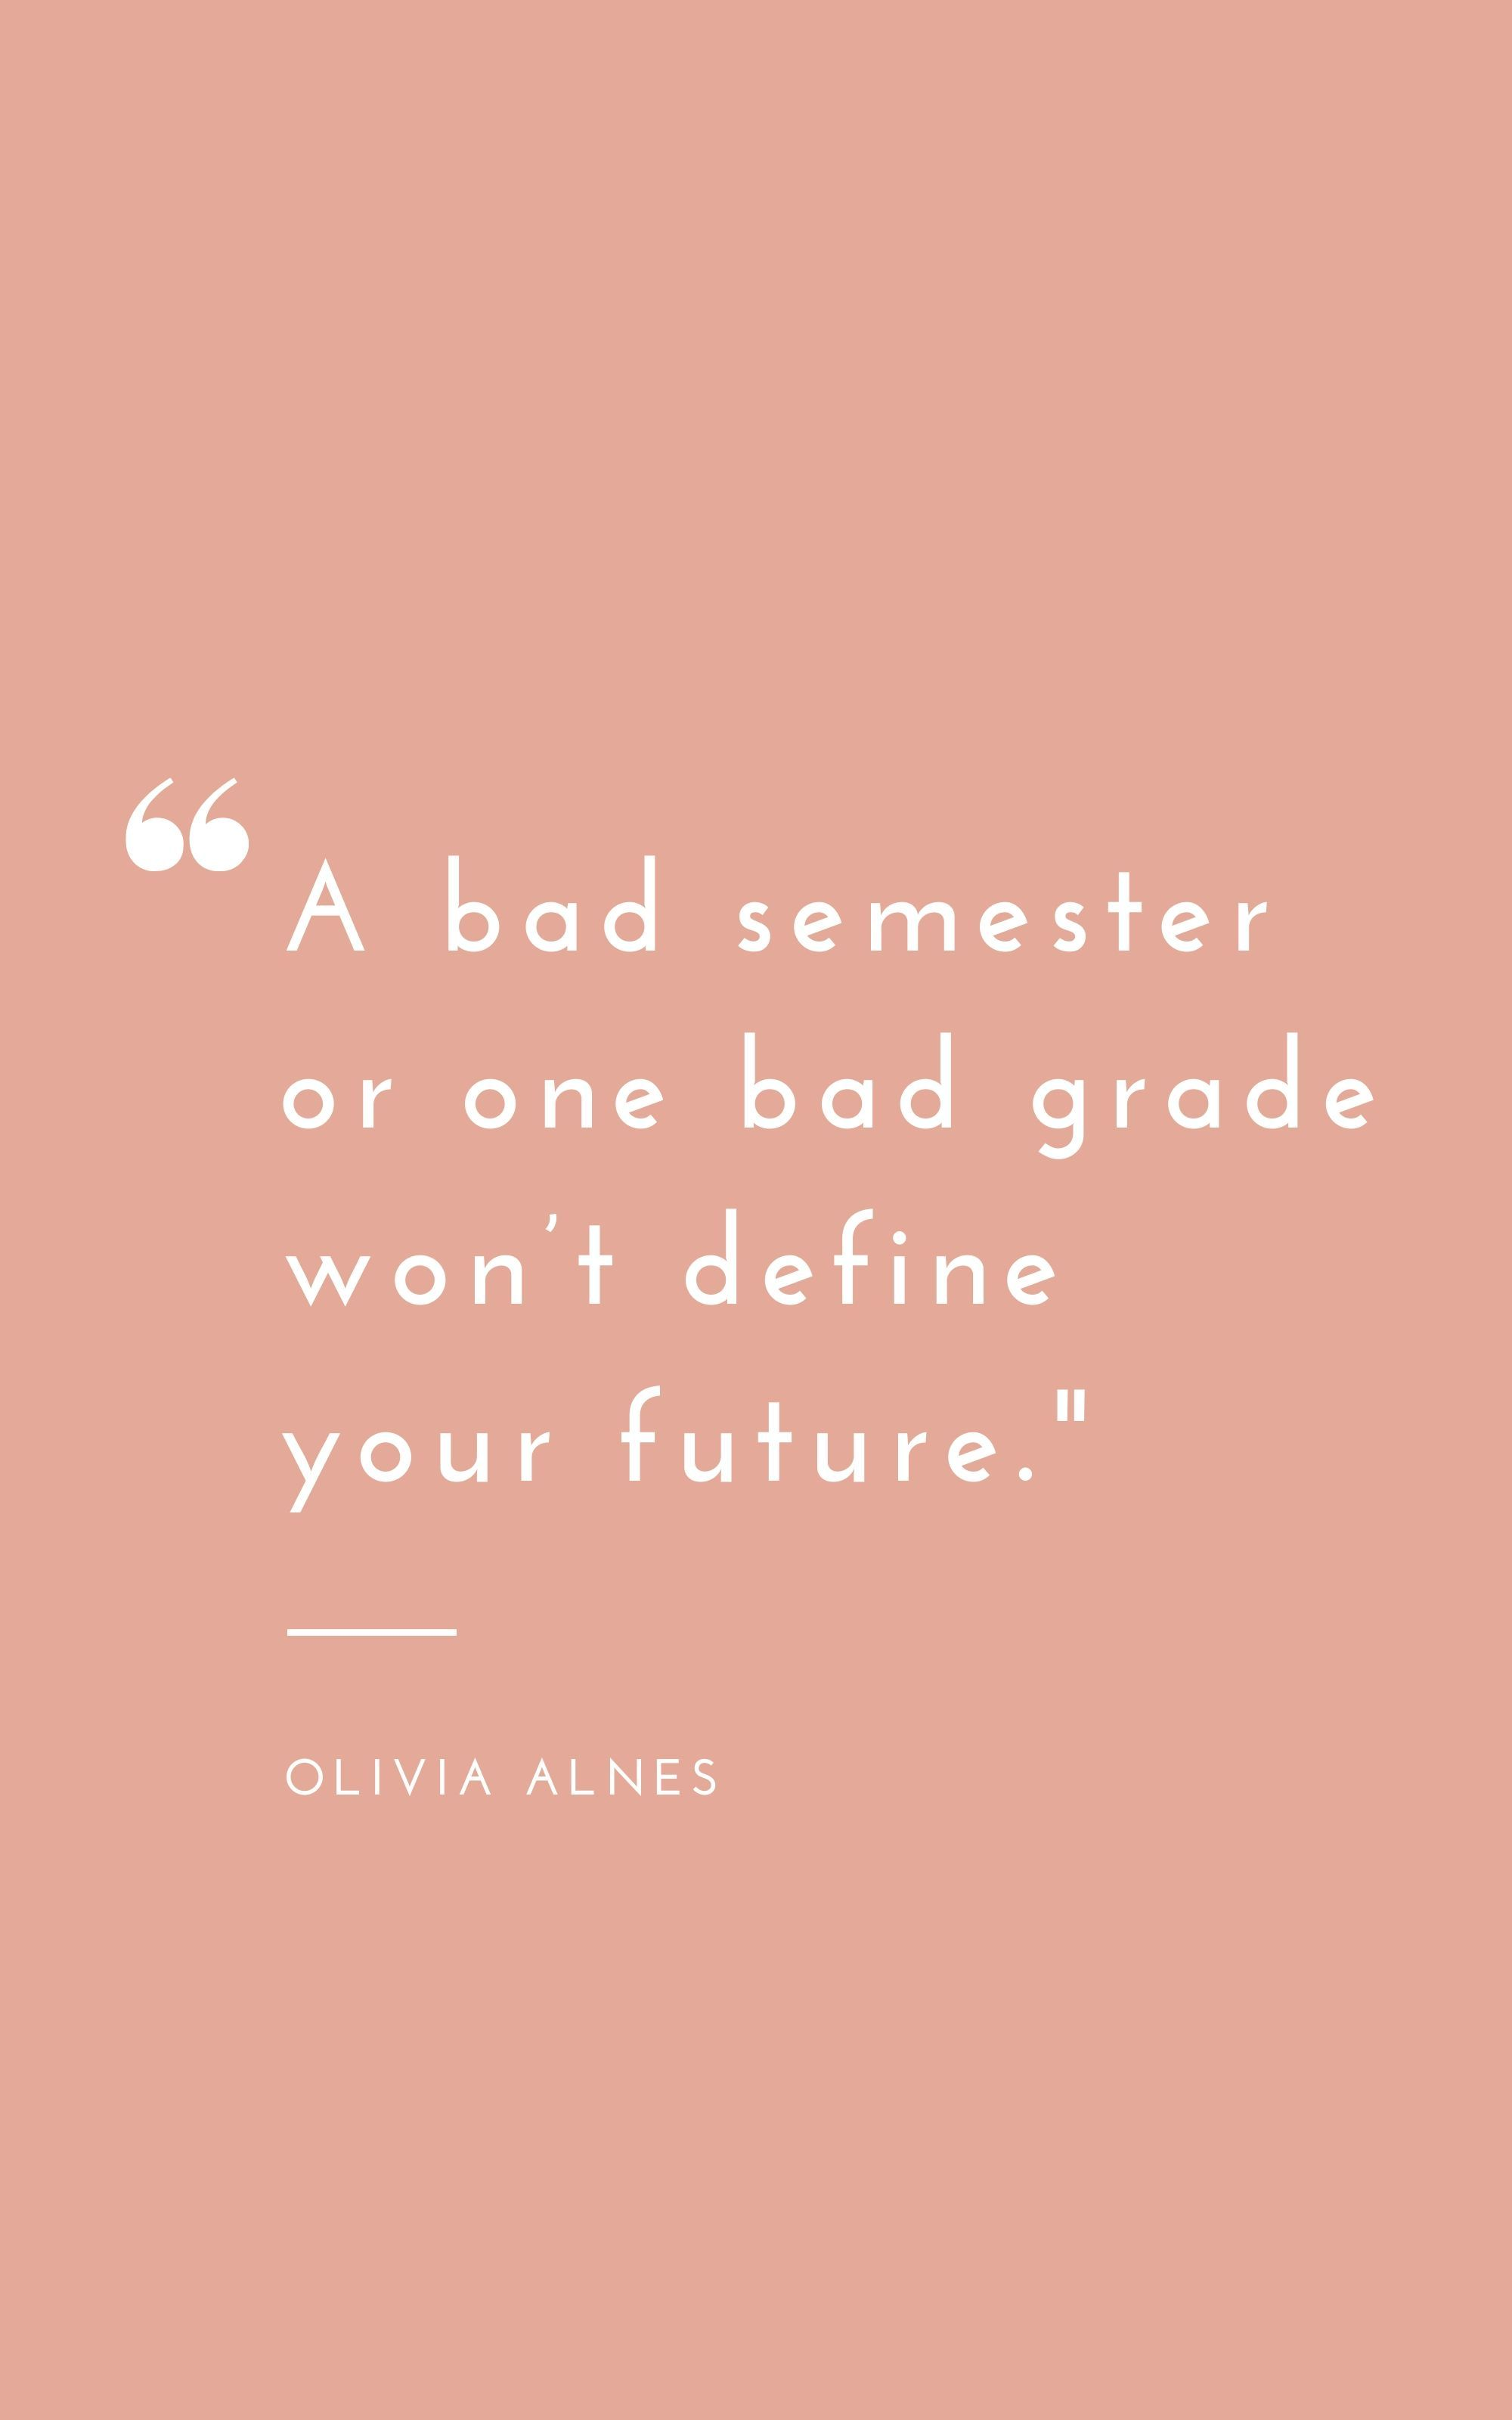 One bad grade won't define your future